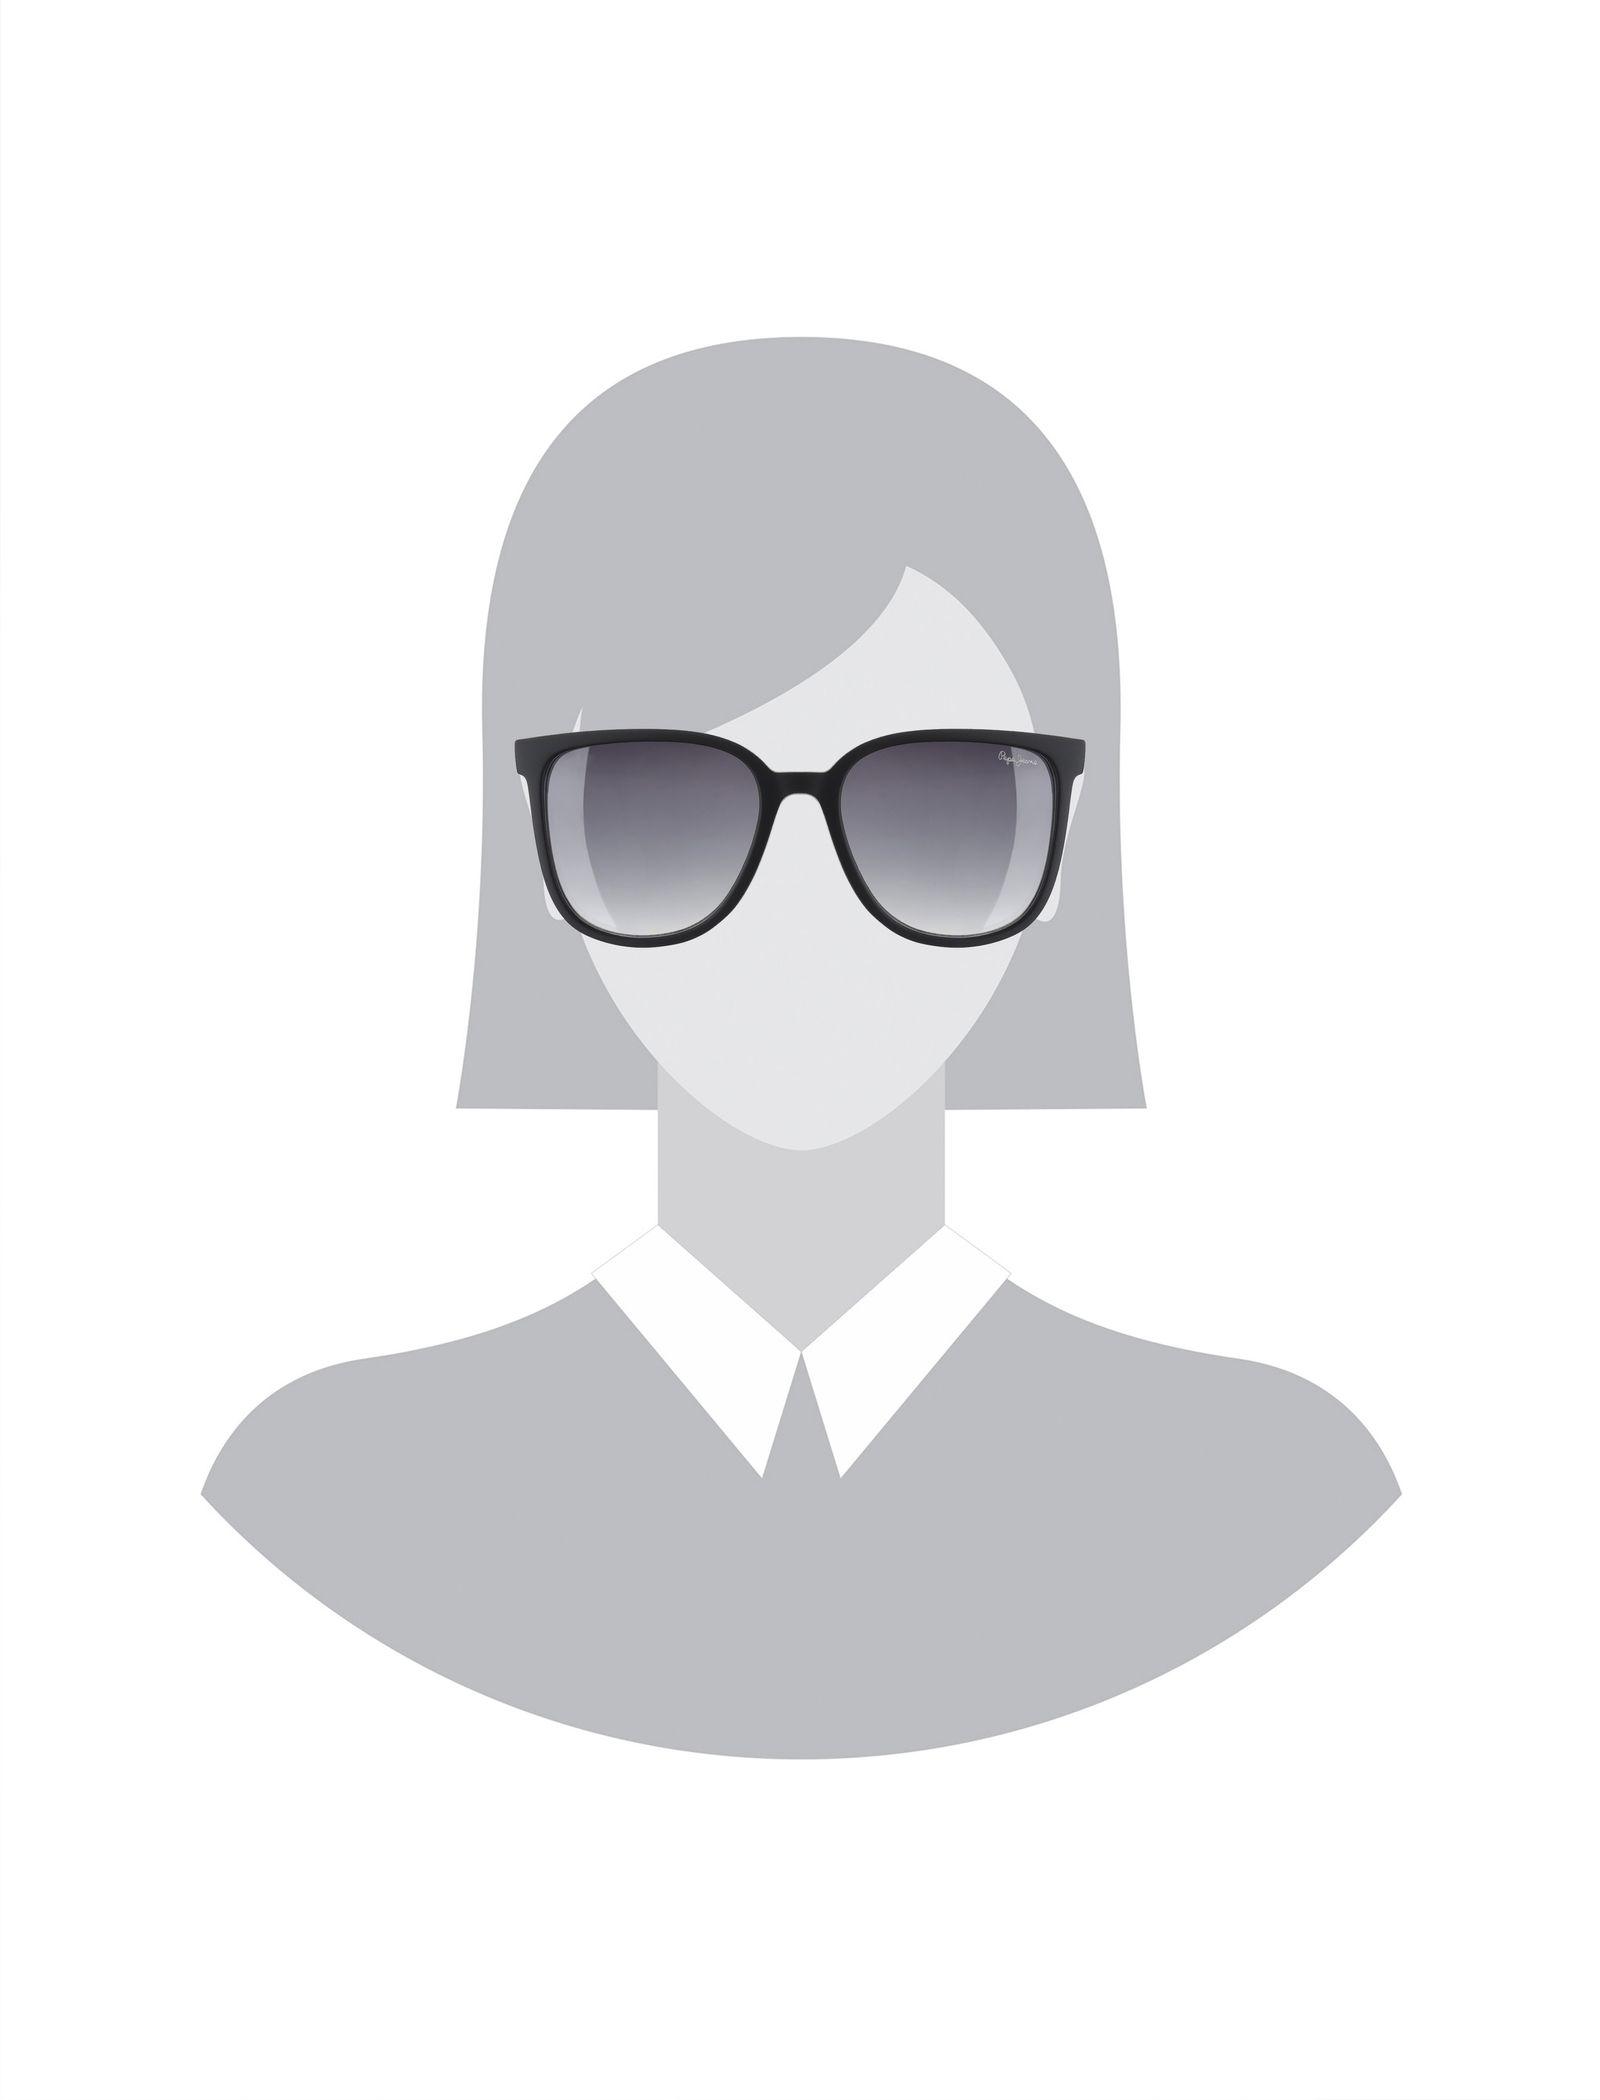 عینک آفتابی ویفرر زنانه - پپه جینز - مشکي - 5